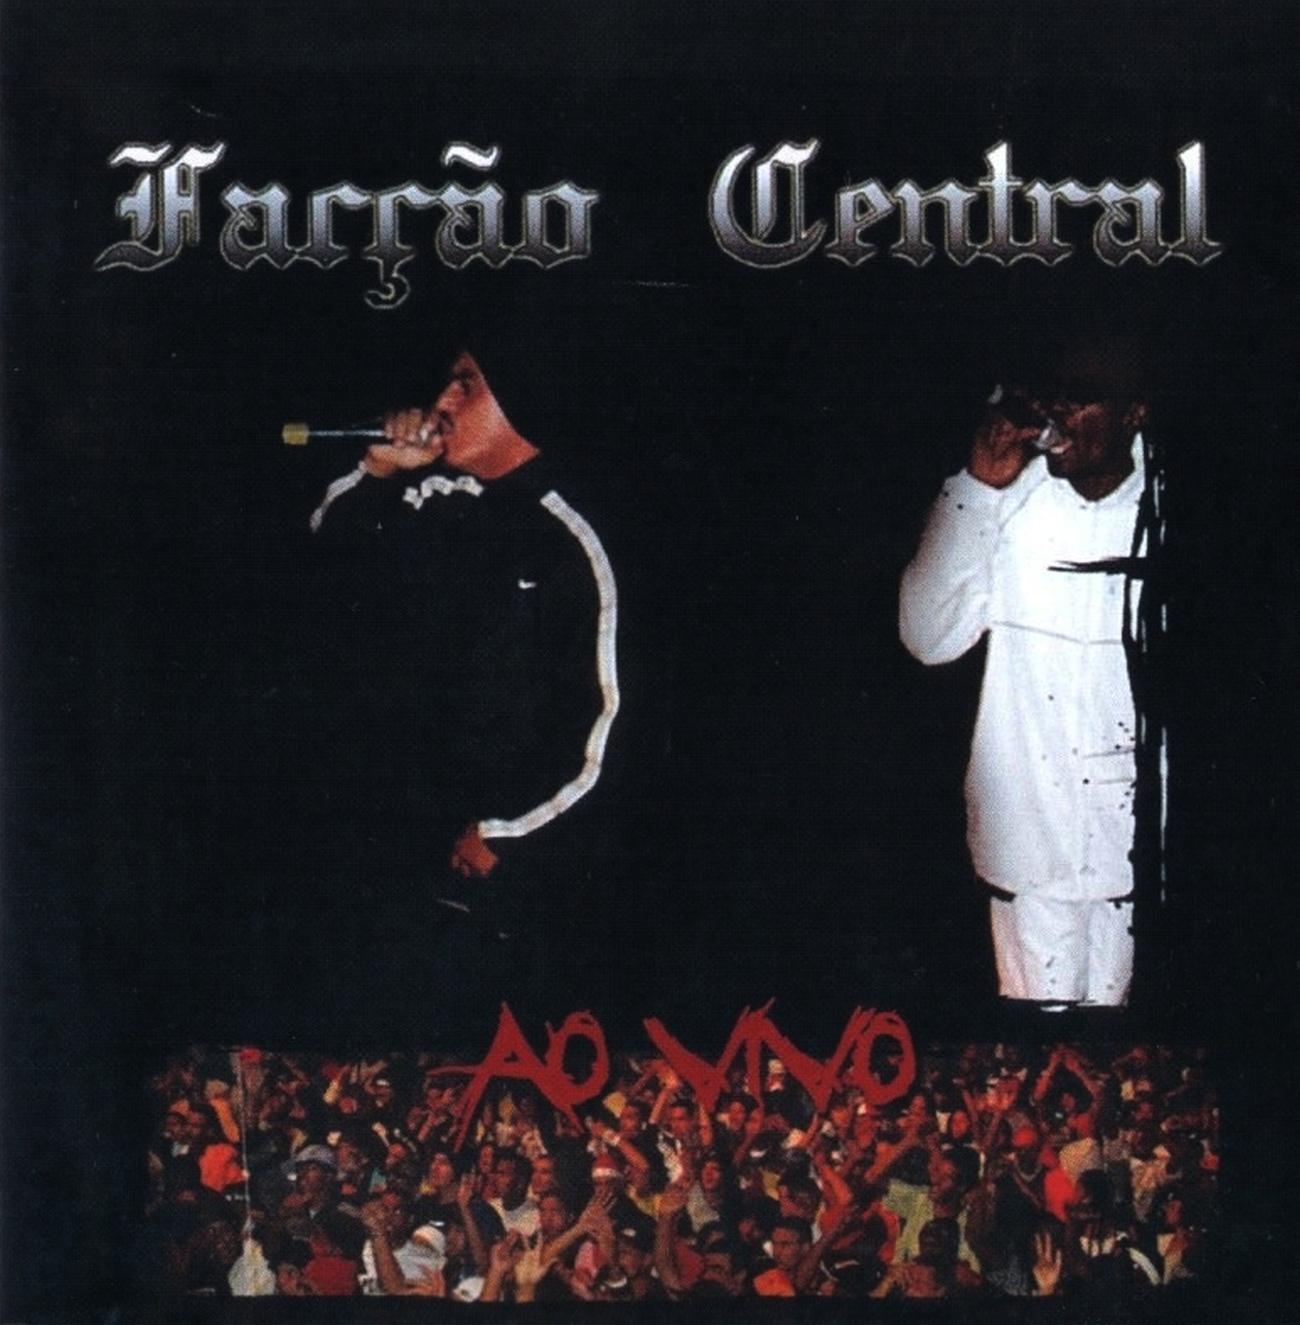 BAIXAR DE FACCAO BLINDADO MUSICA HOJE ANDA DEUS CENTRAL